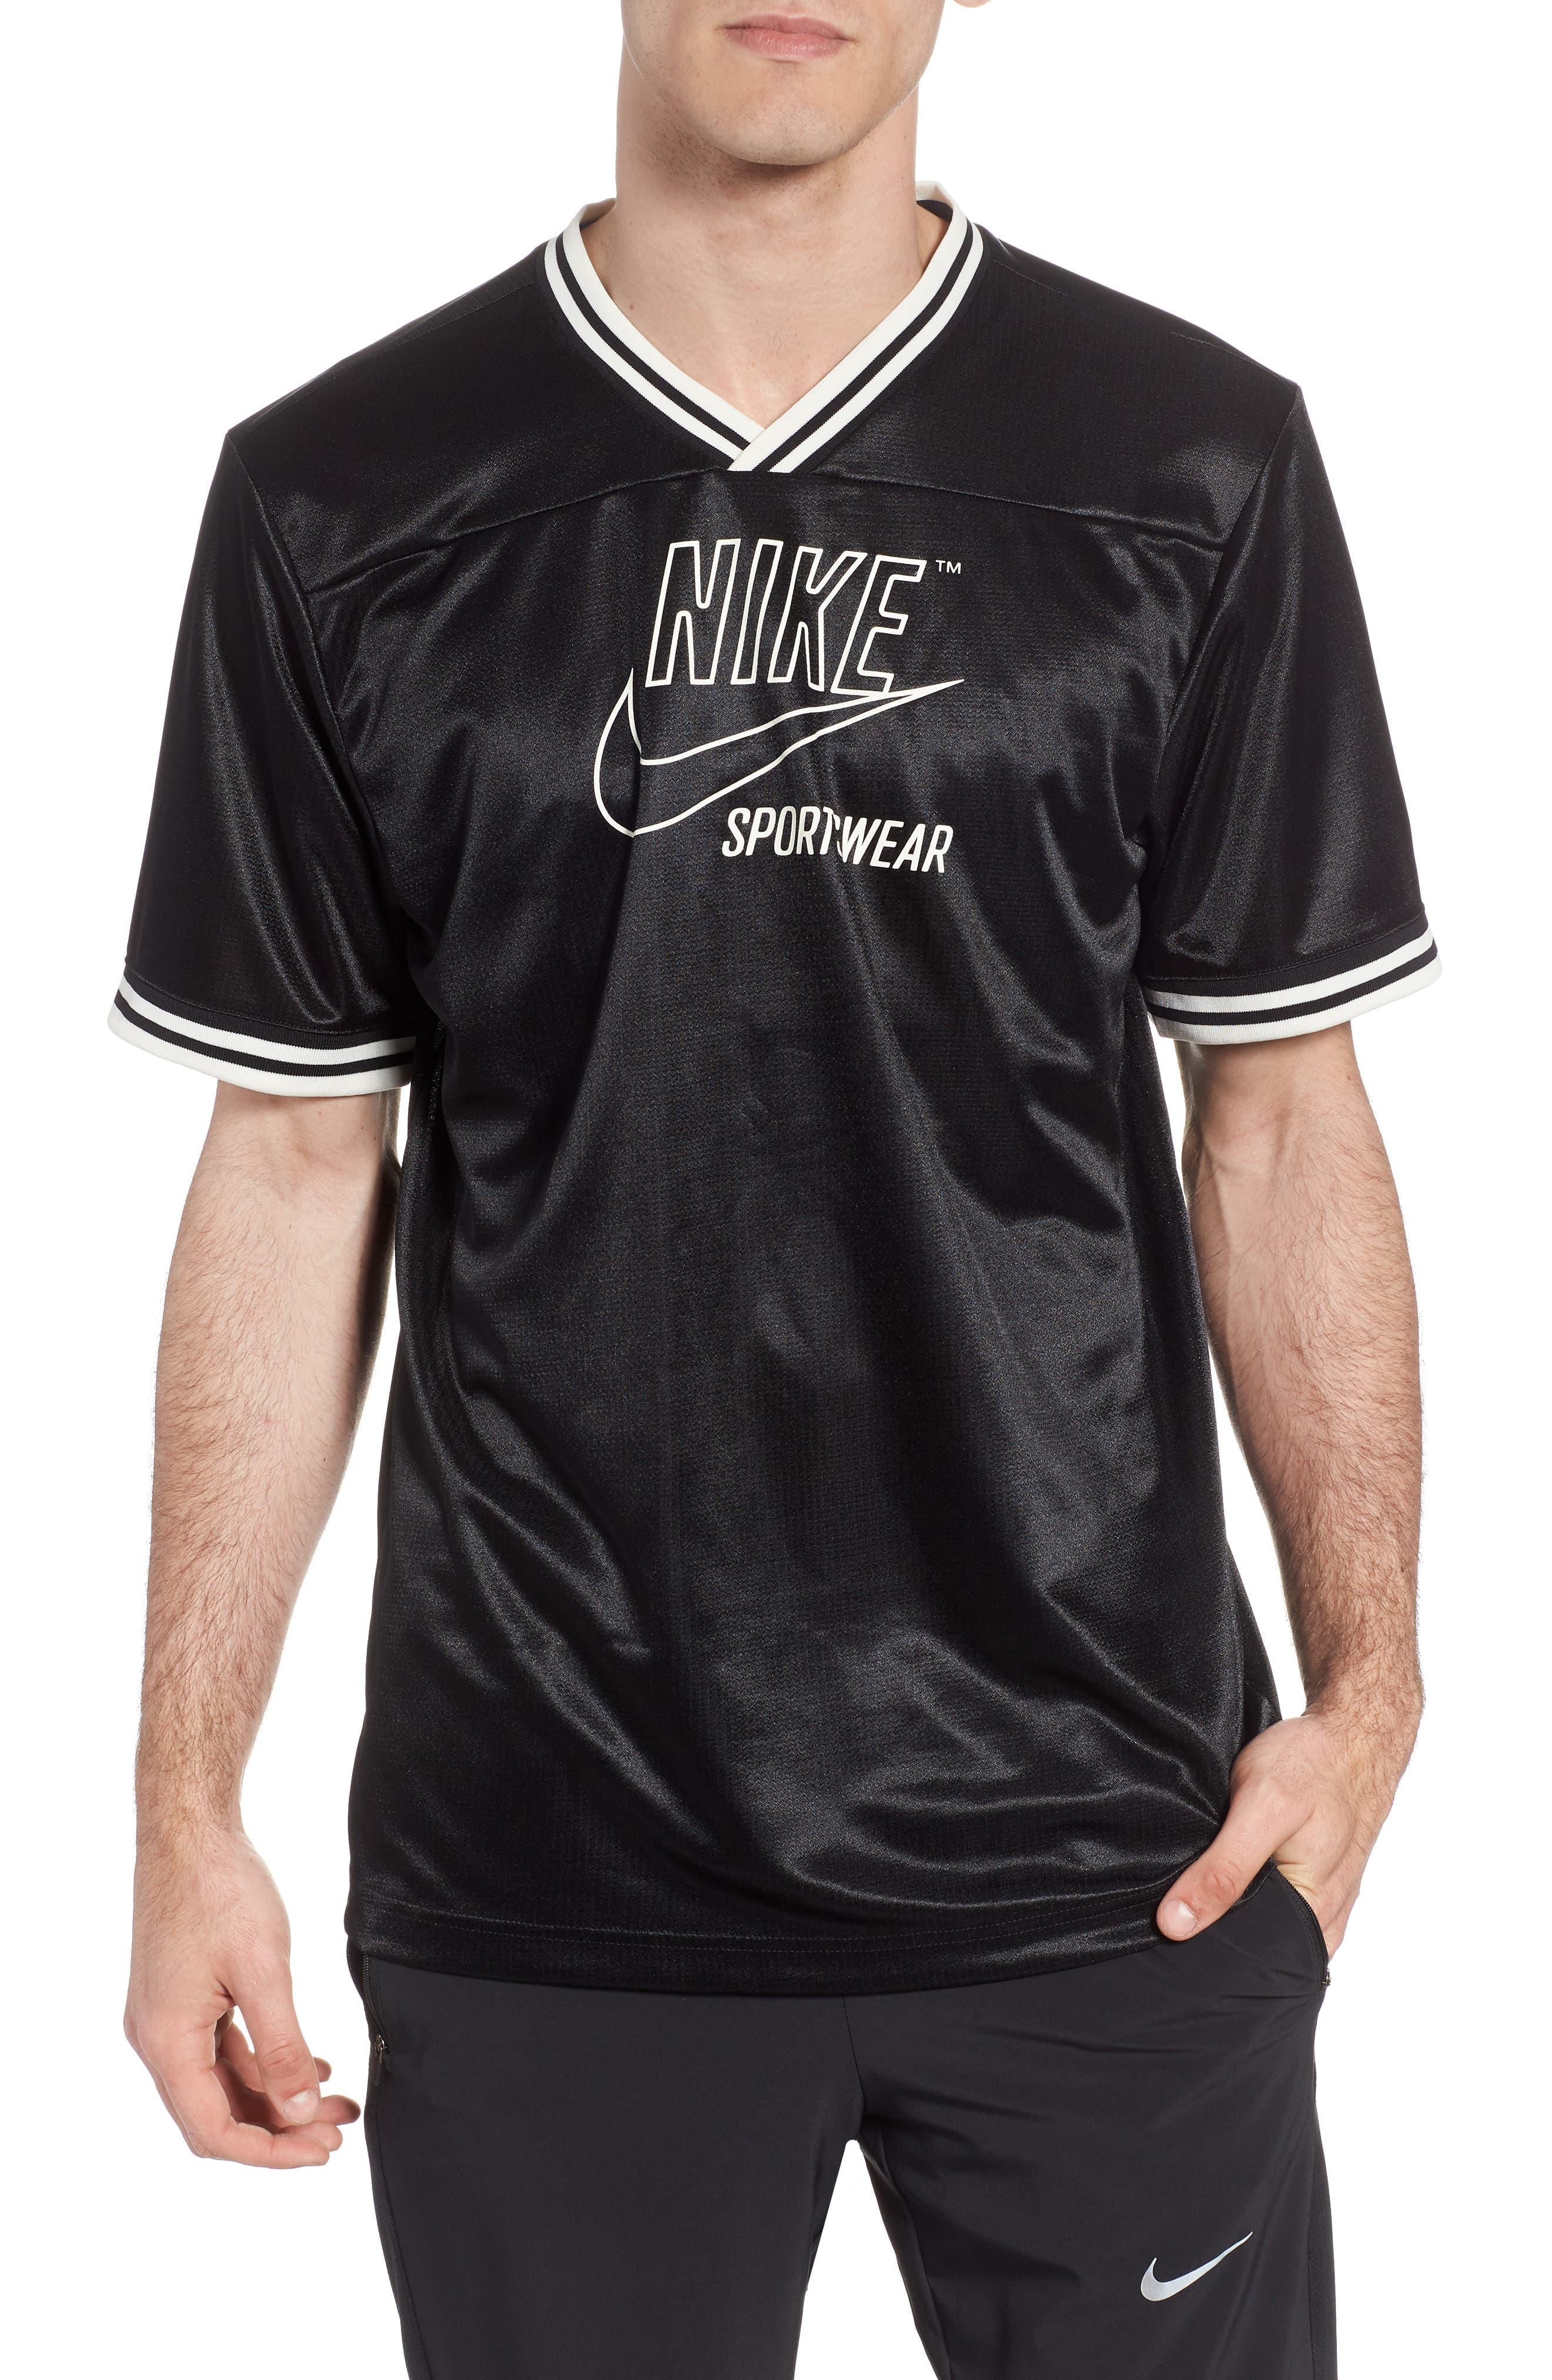 Nike Nsw Archive V-Neck T-Shirt, Black